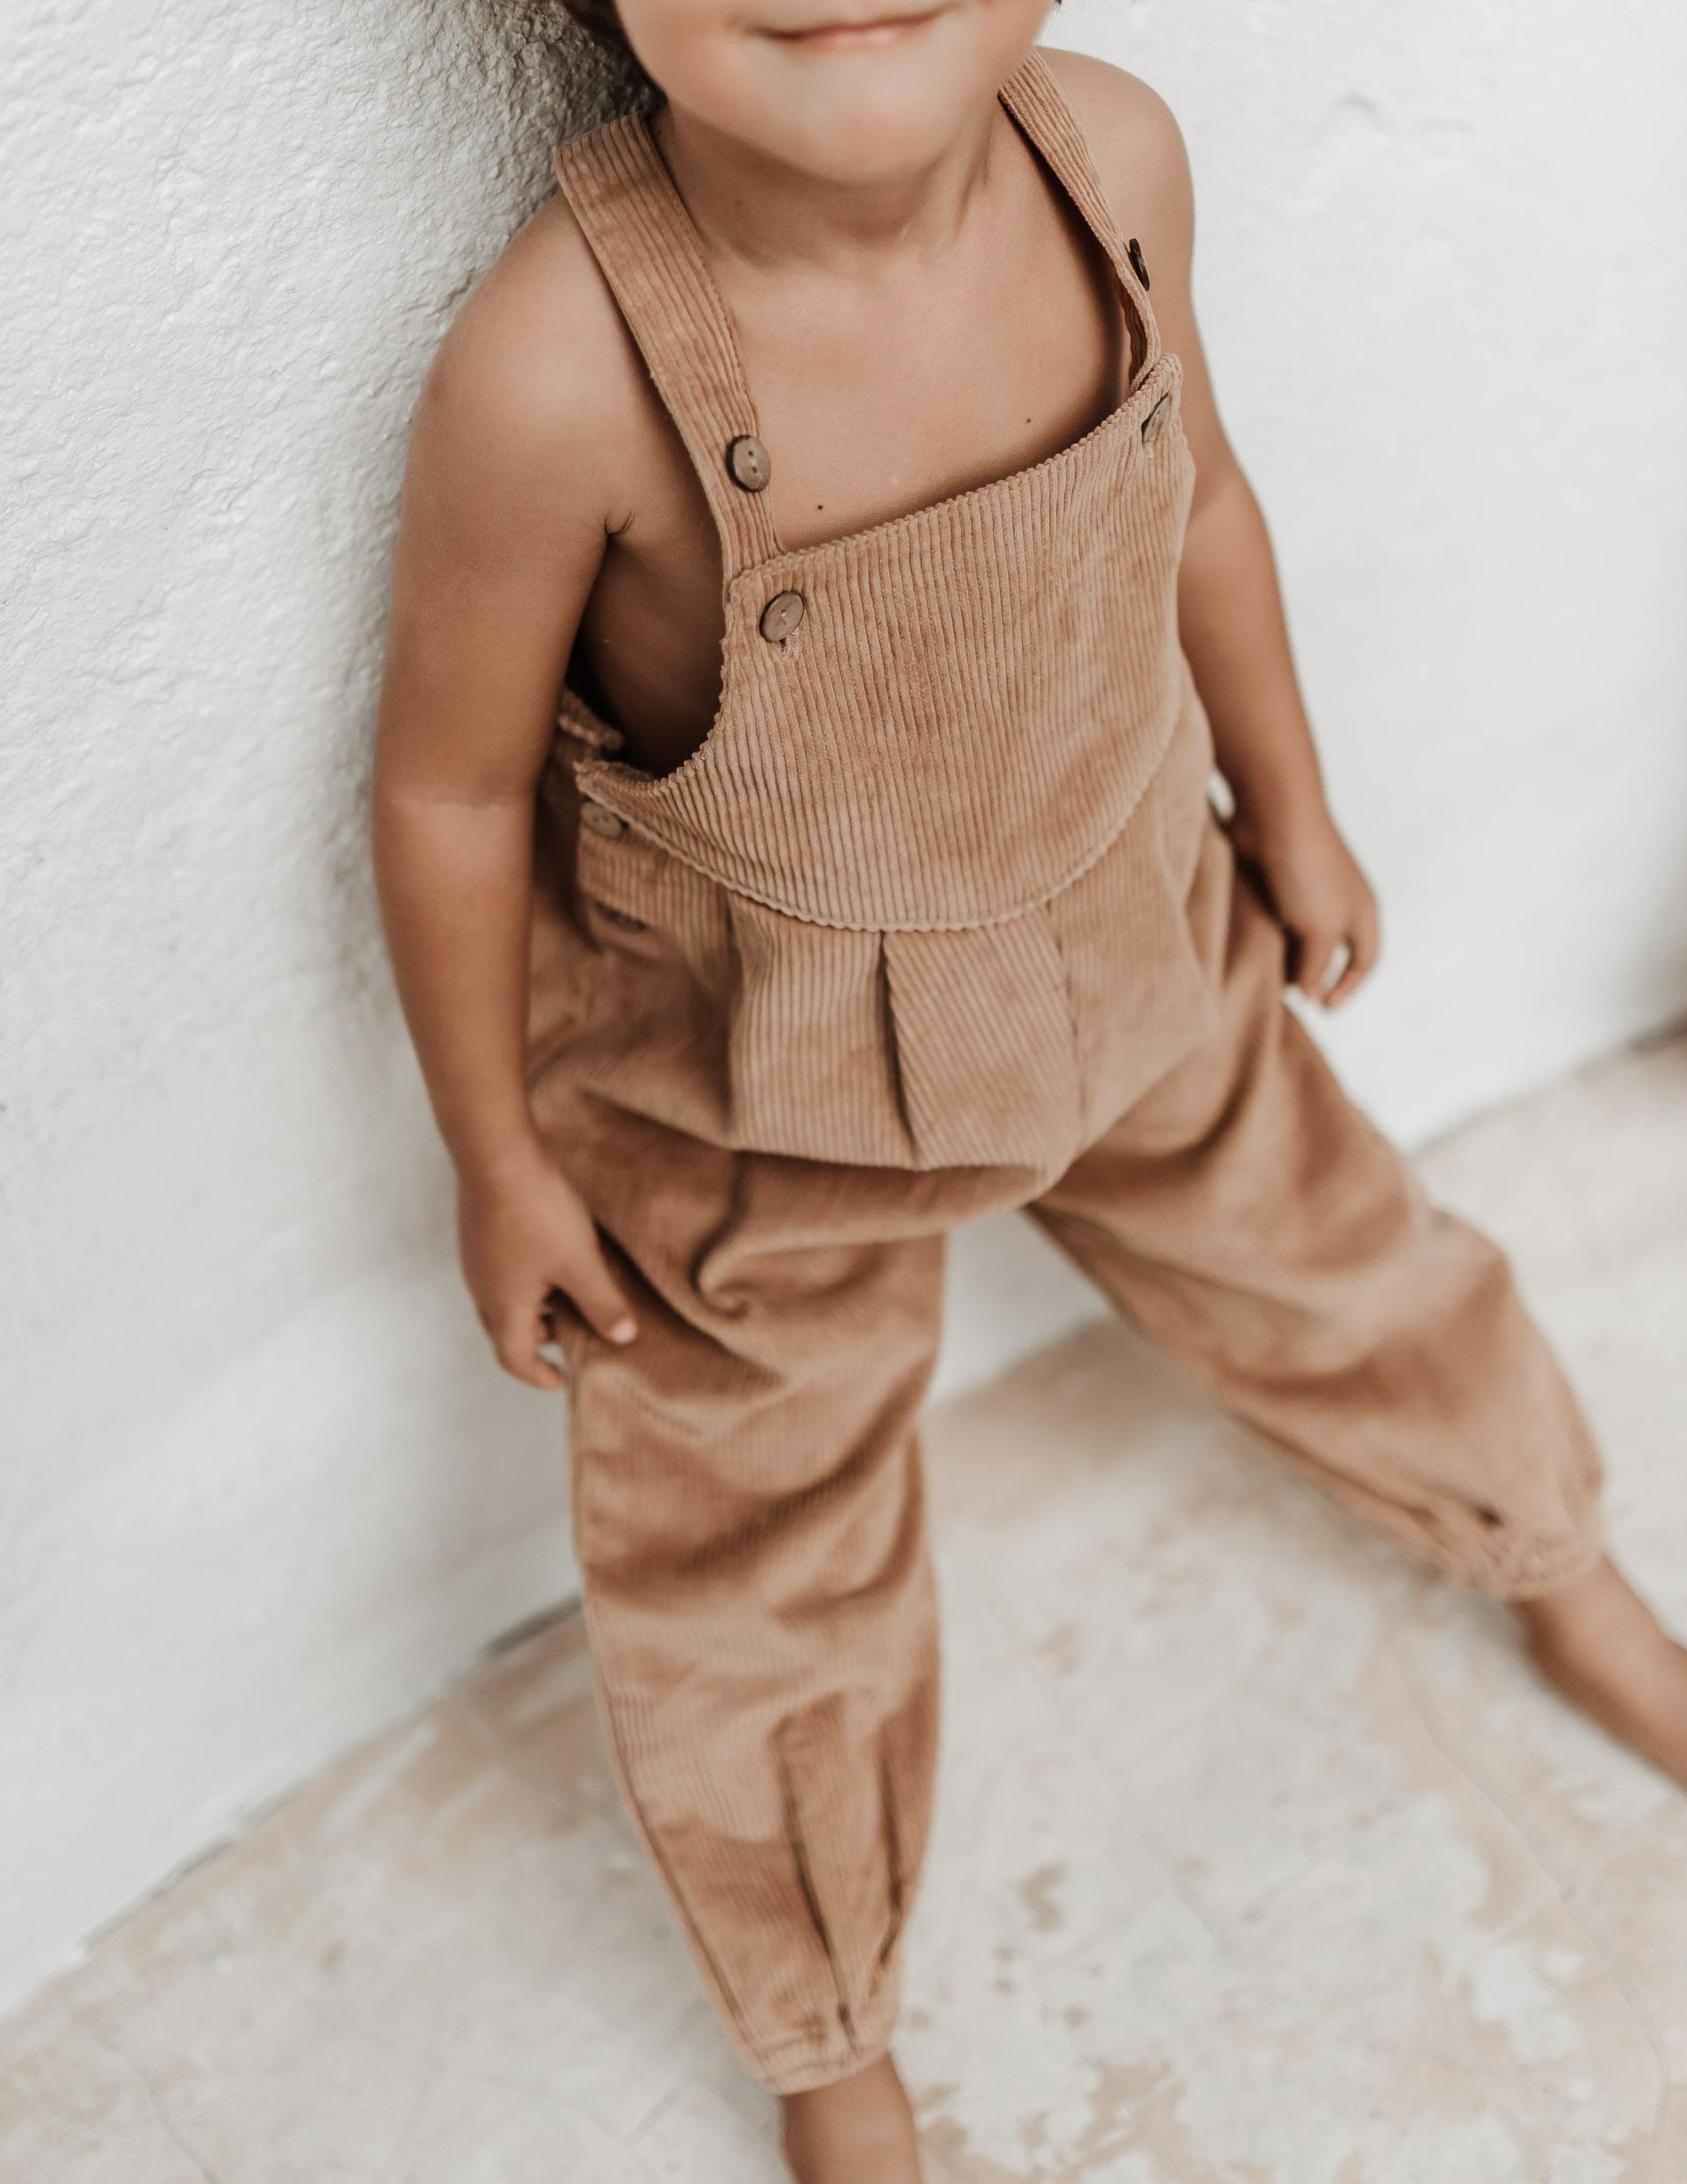 keira-mason-illoura-the-label-boy-in-overalls.jpg